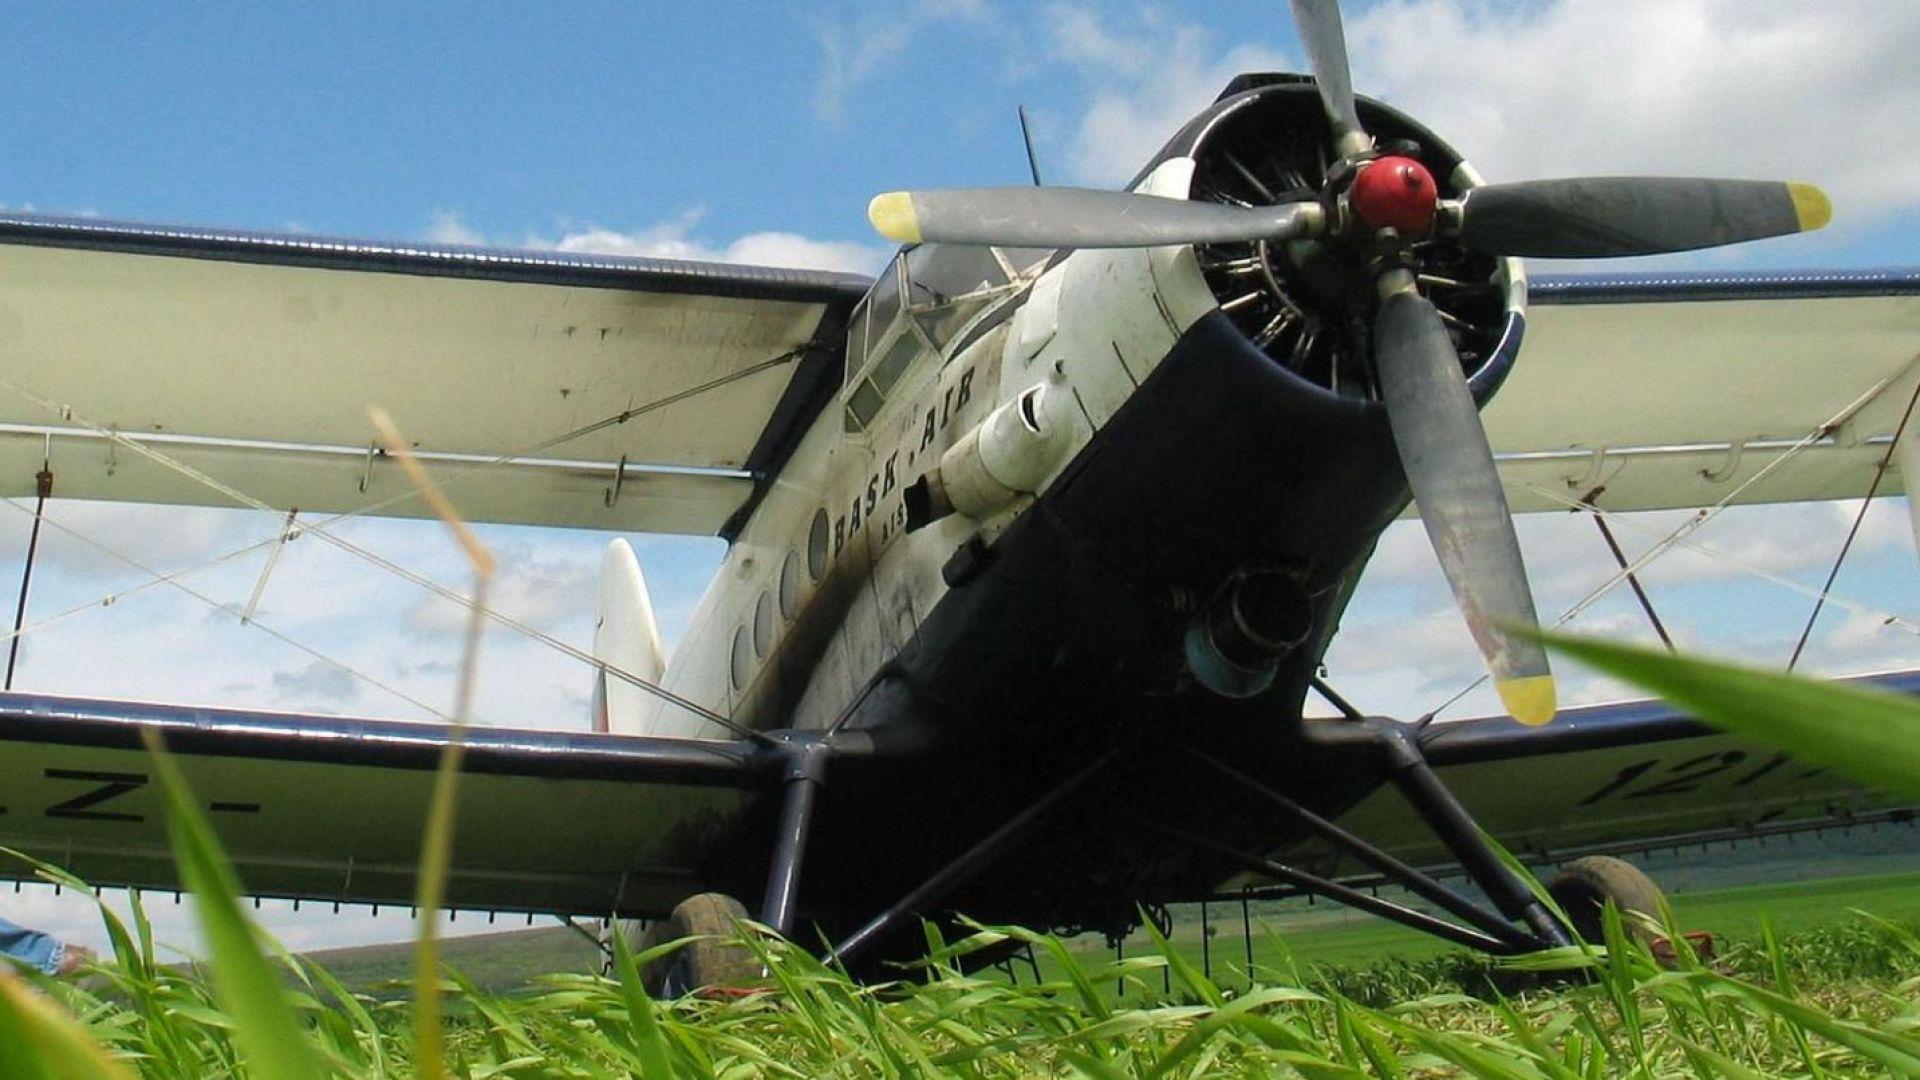 Пуснаха от самолет 5 тона дезинфектант над Карнобат